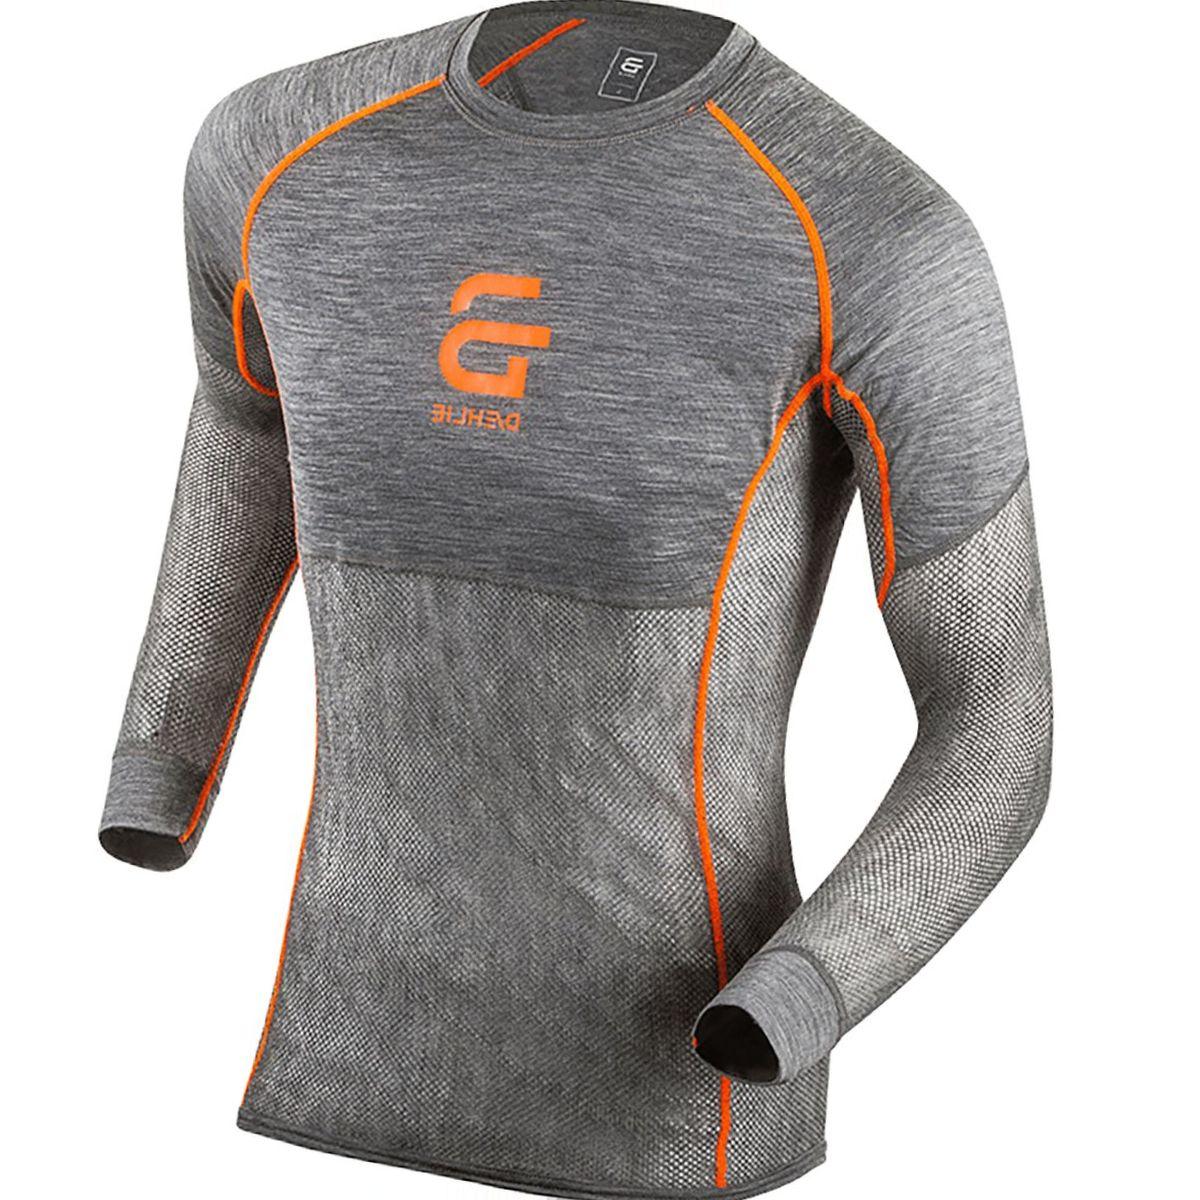 Bjorn Daehlie Airnet Shirt - Men's